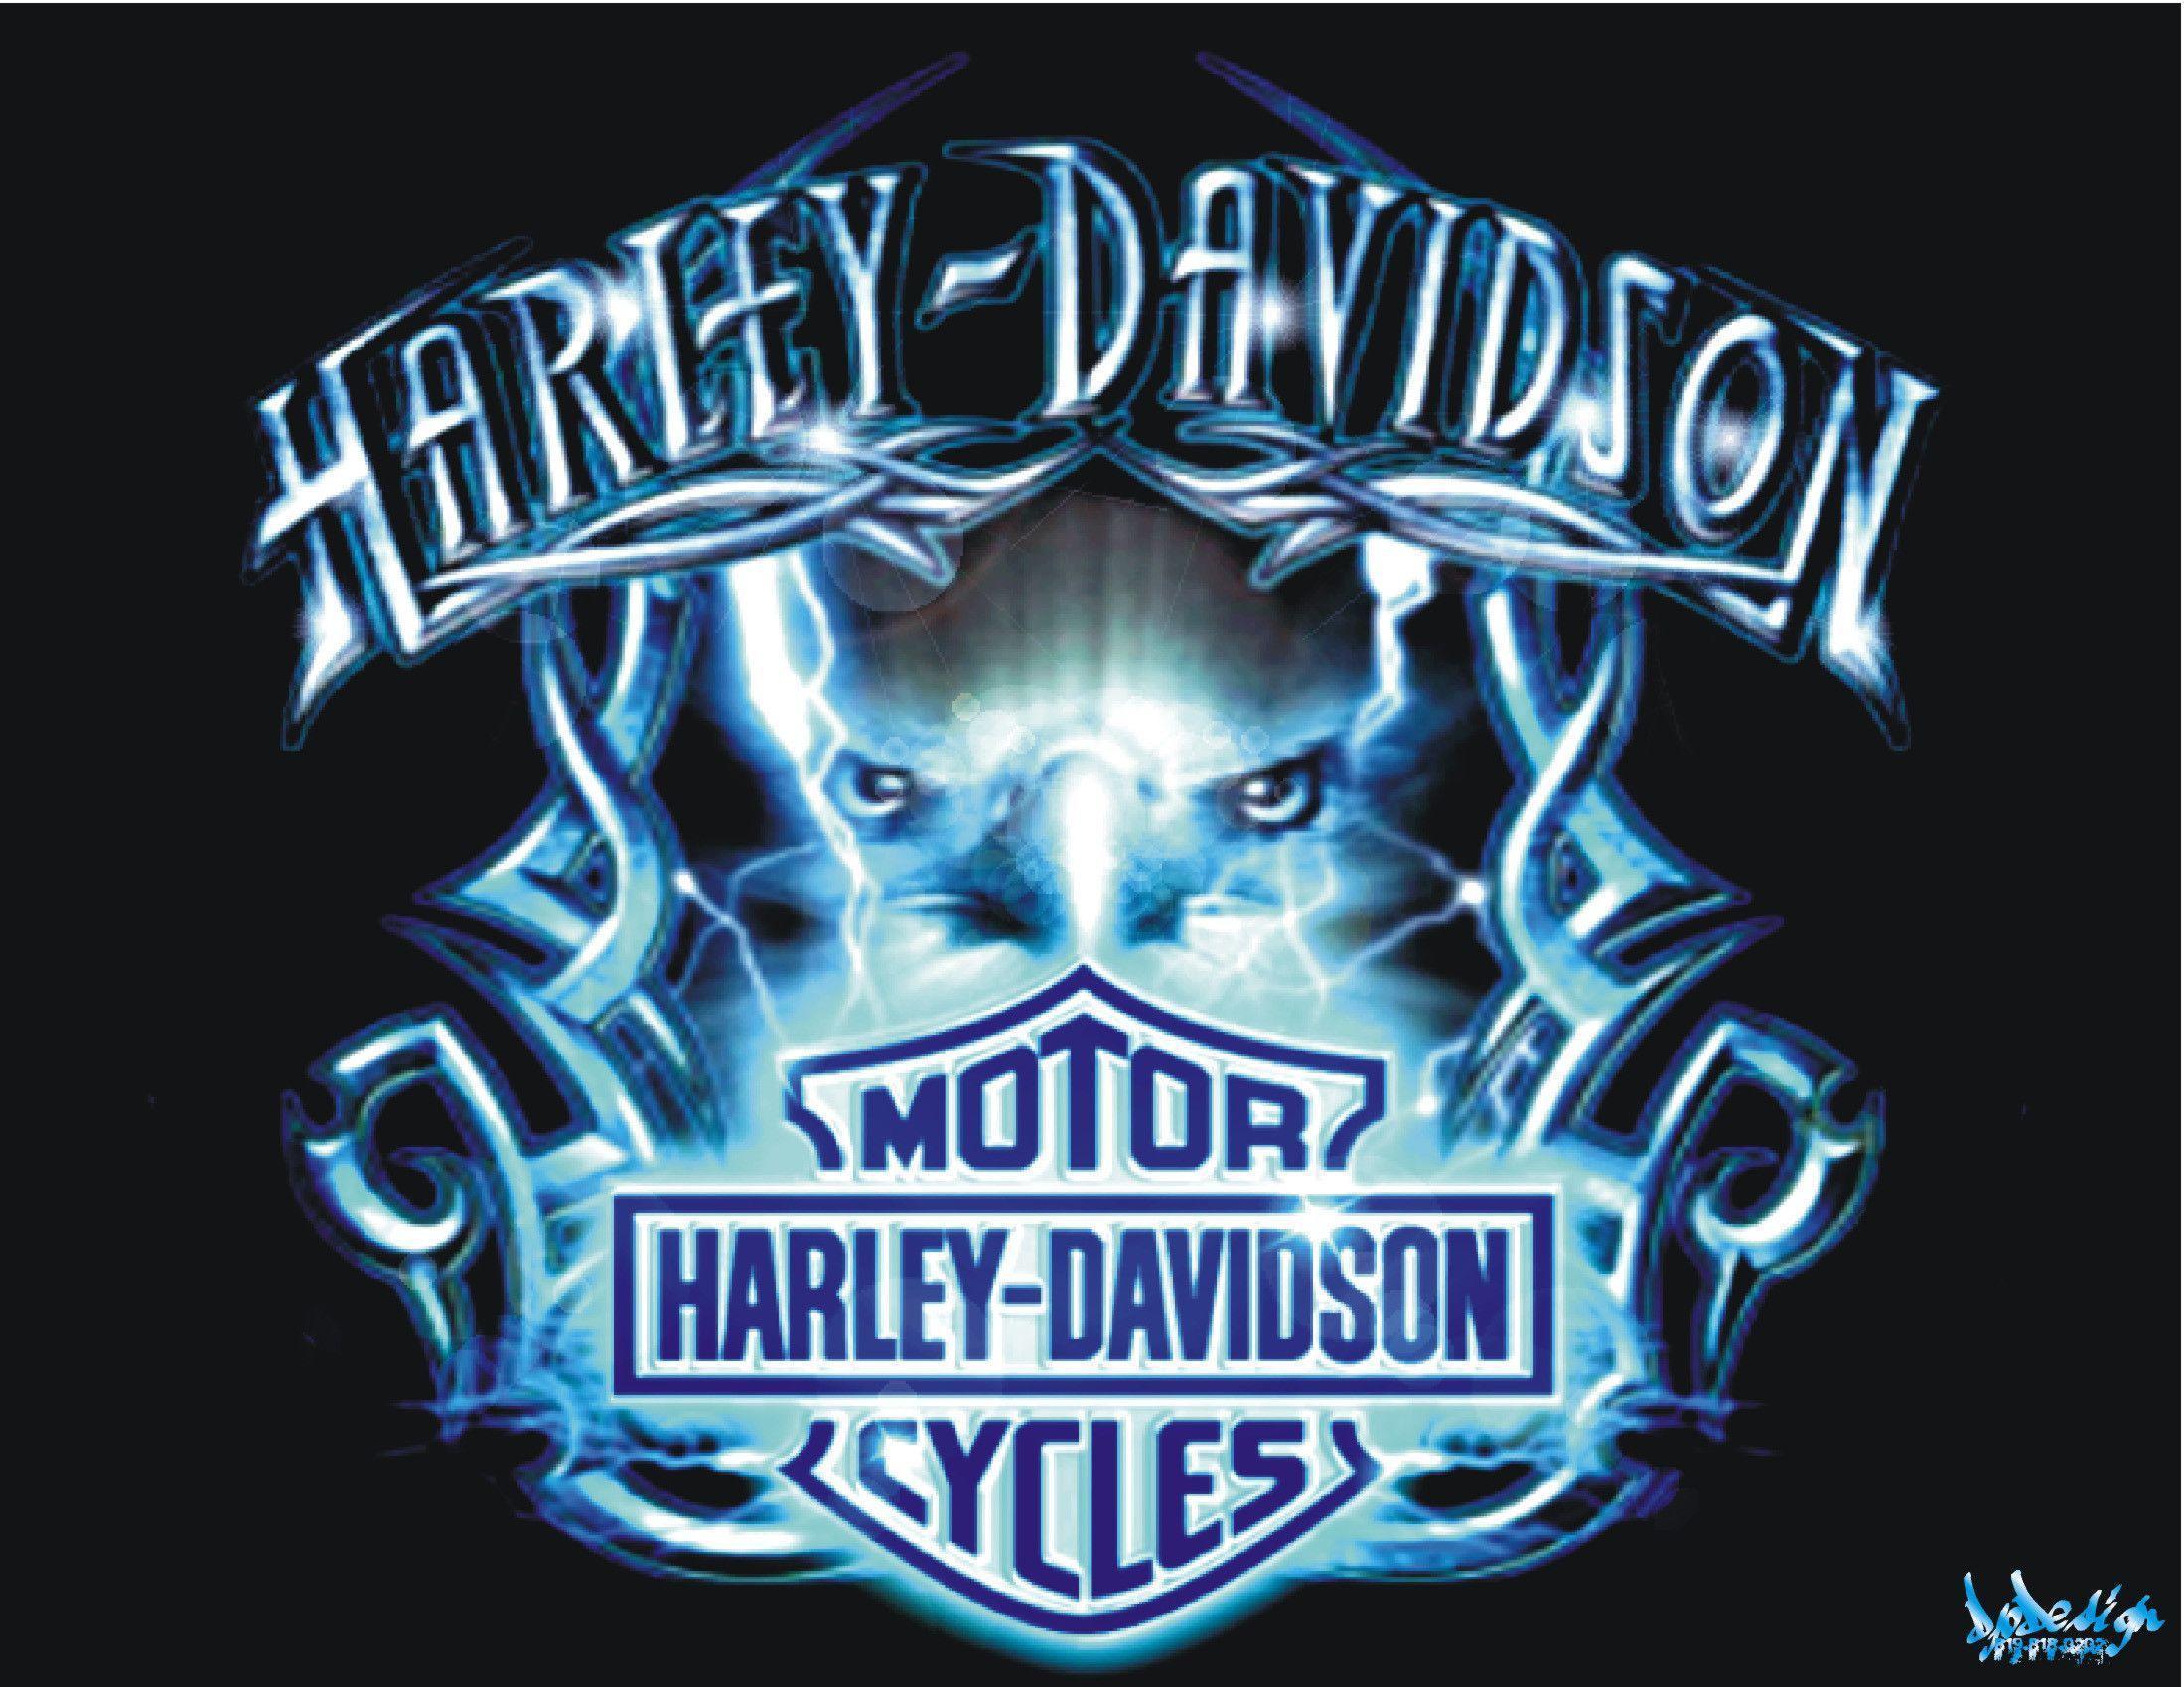 harley davidson logo wallpapers wallpaper cave harley davidson logo wallpaper 1920x1080 harley davidson logo wallpaper iphone